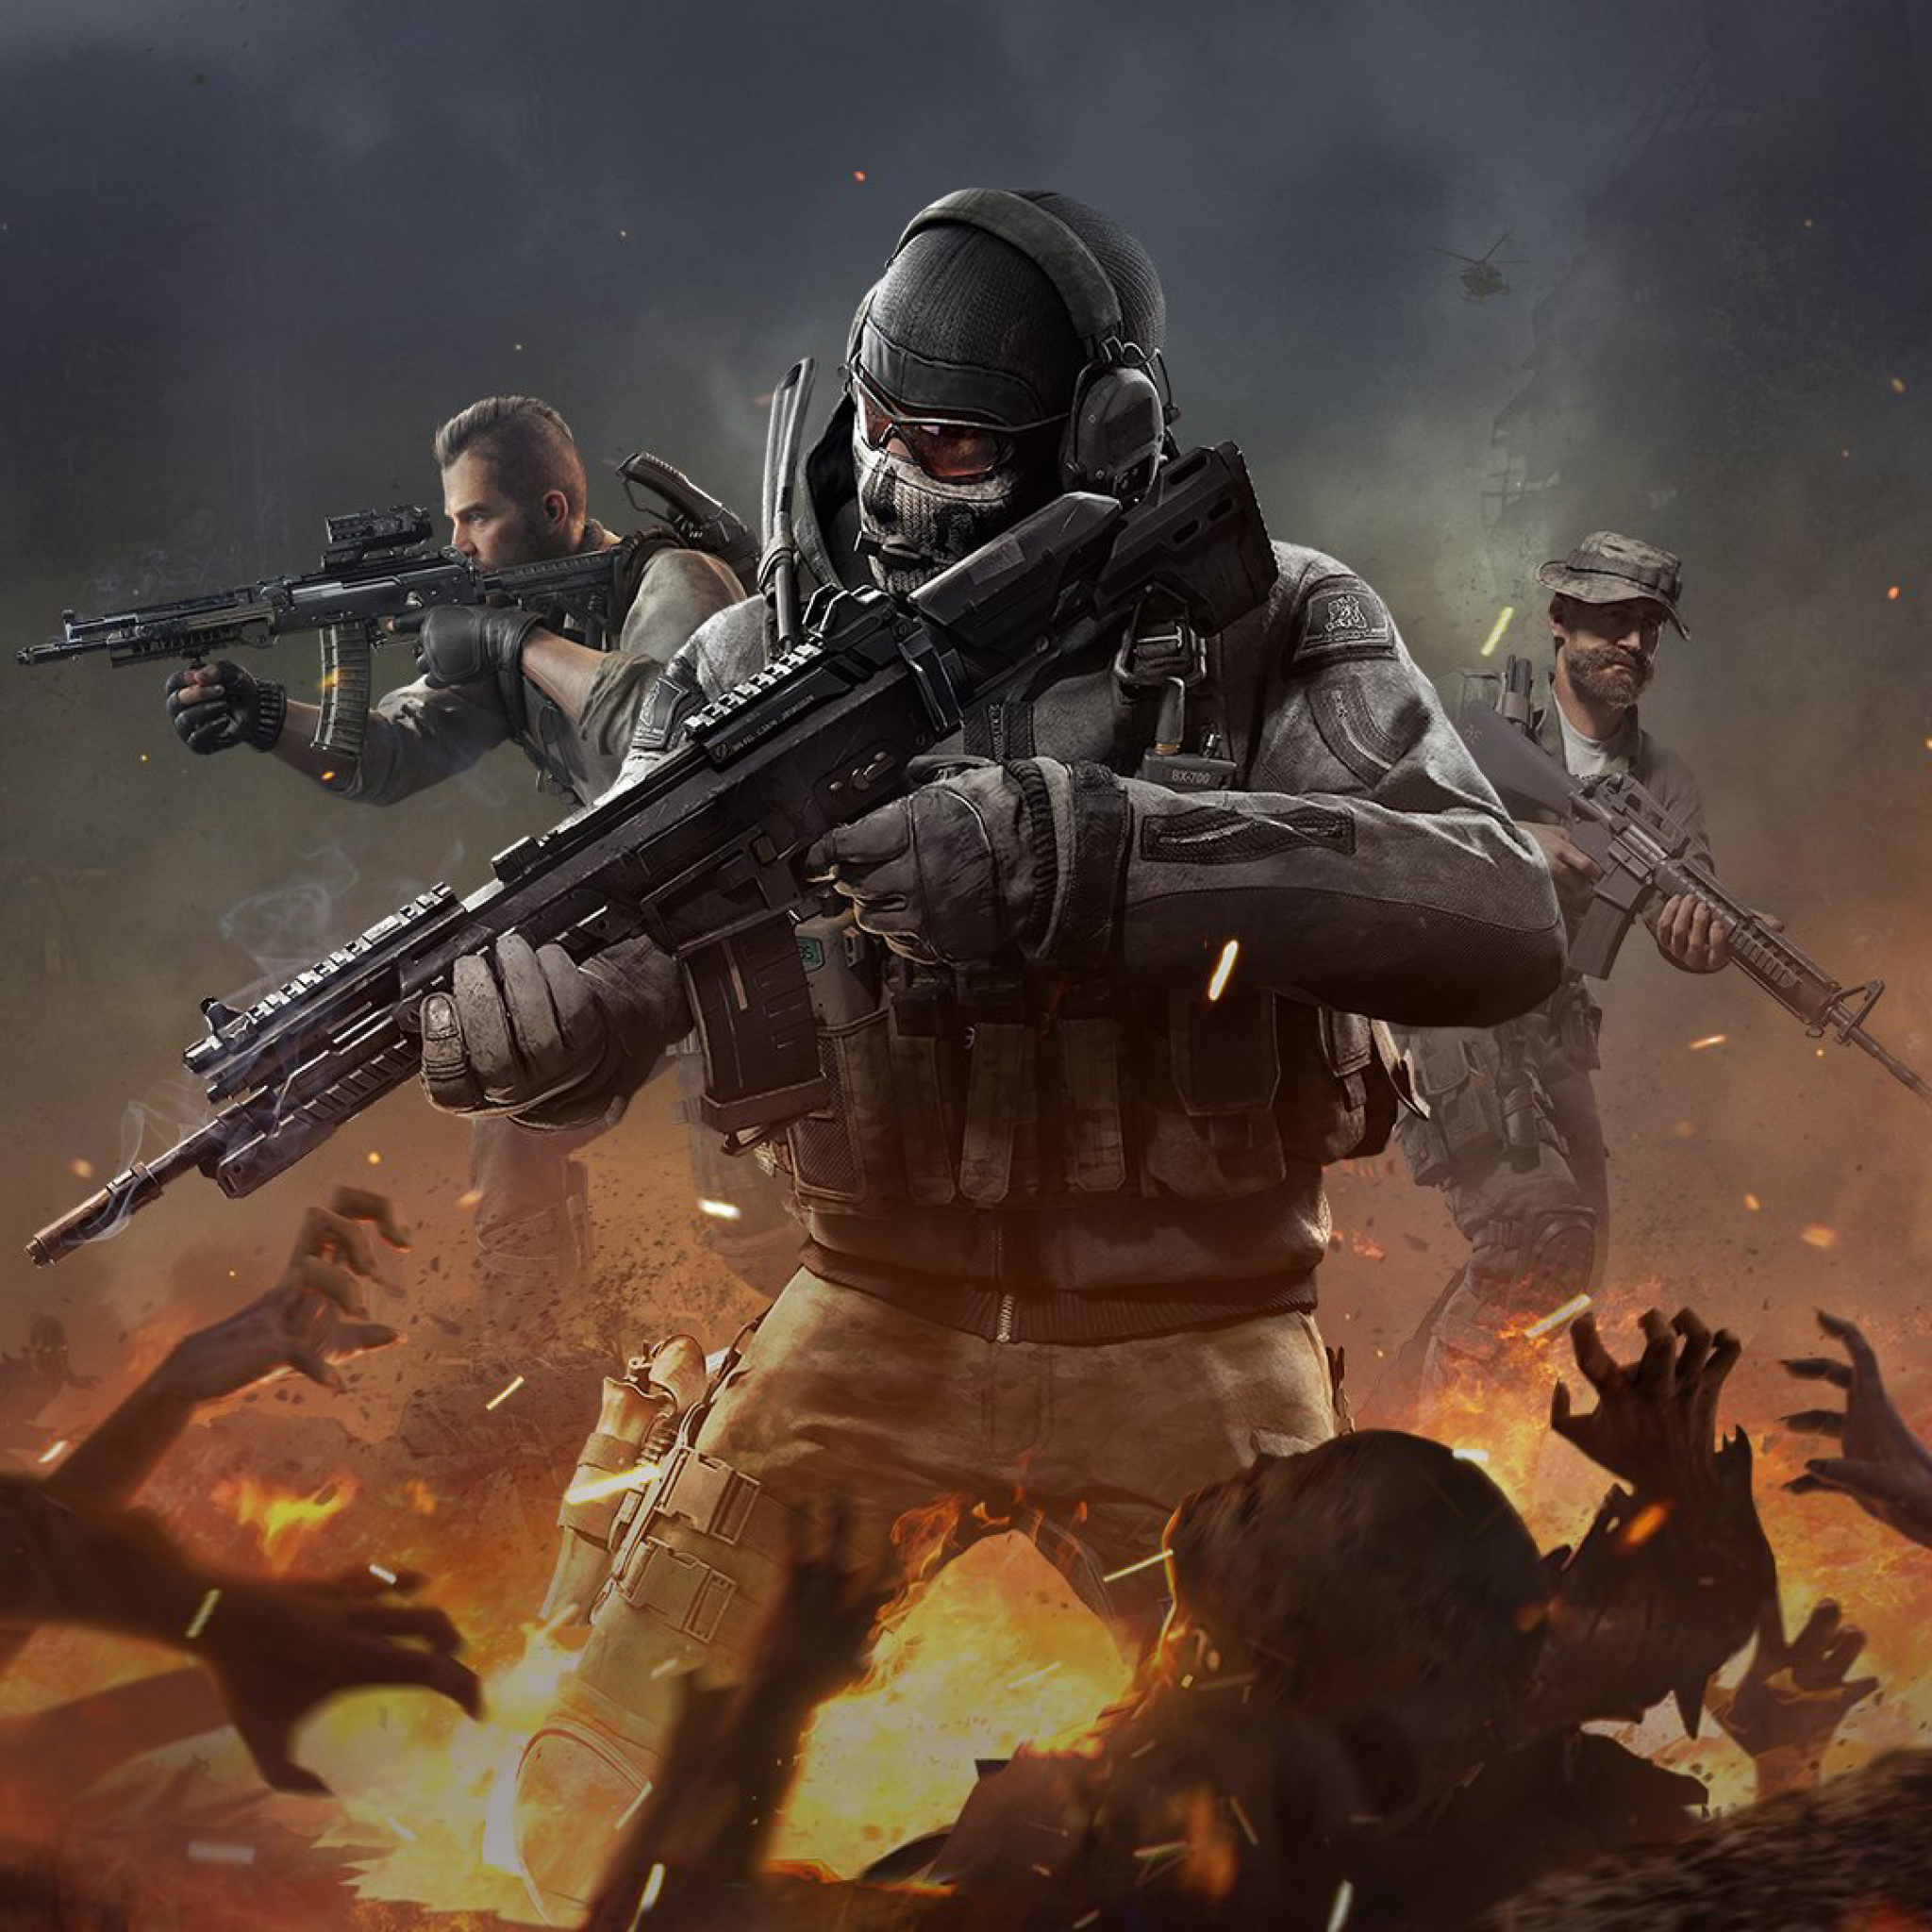 2048x2048 Call Of Duty Mobile 2020 Ipad Air Wallpaper, HD ...